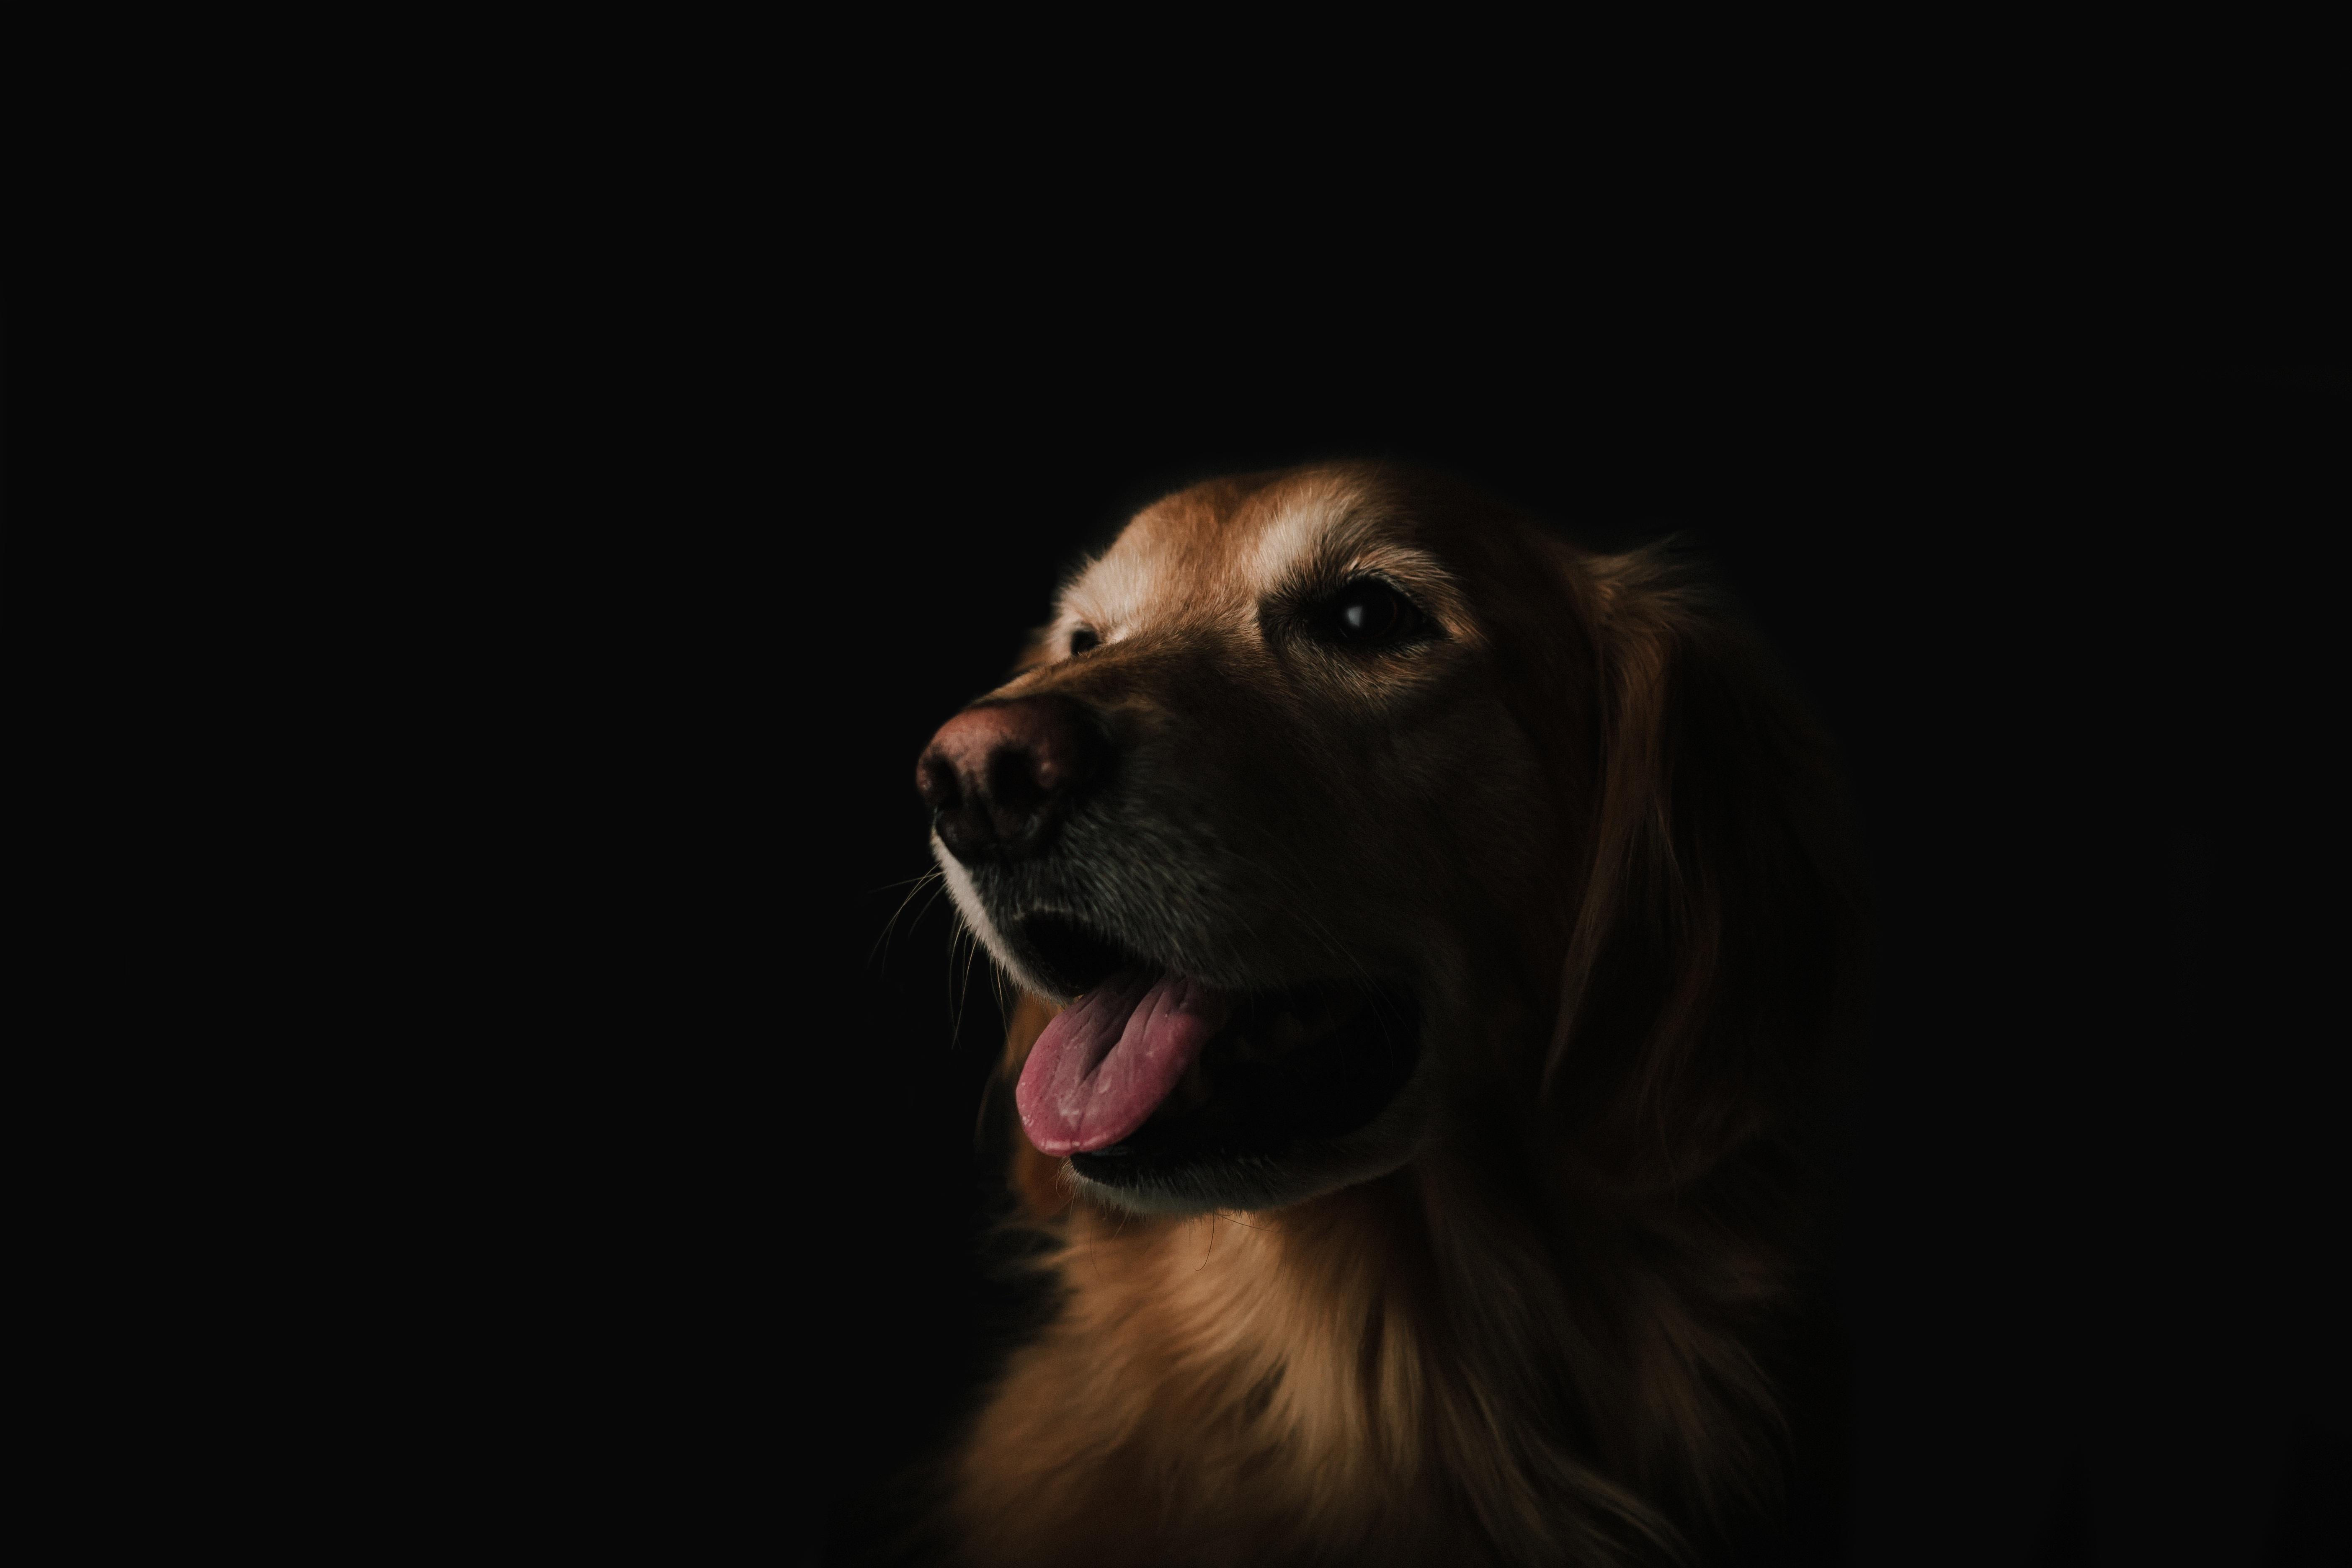 Wonderful Fur Brown Adorable Dog - puppy-dog-animal-cute-canine-pet-fur-portrait-brown-mammal-face-golden-retriever-furry-vertebrate-labrador-retriever-tongue-domestic-adorable-retriever-doggy-dog-like-mammal-559505  Pictures_909941  .jpg